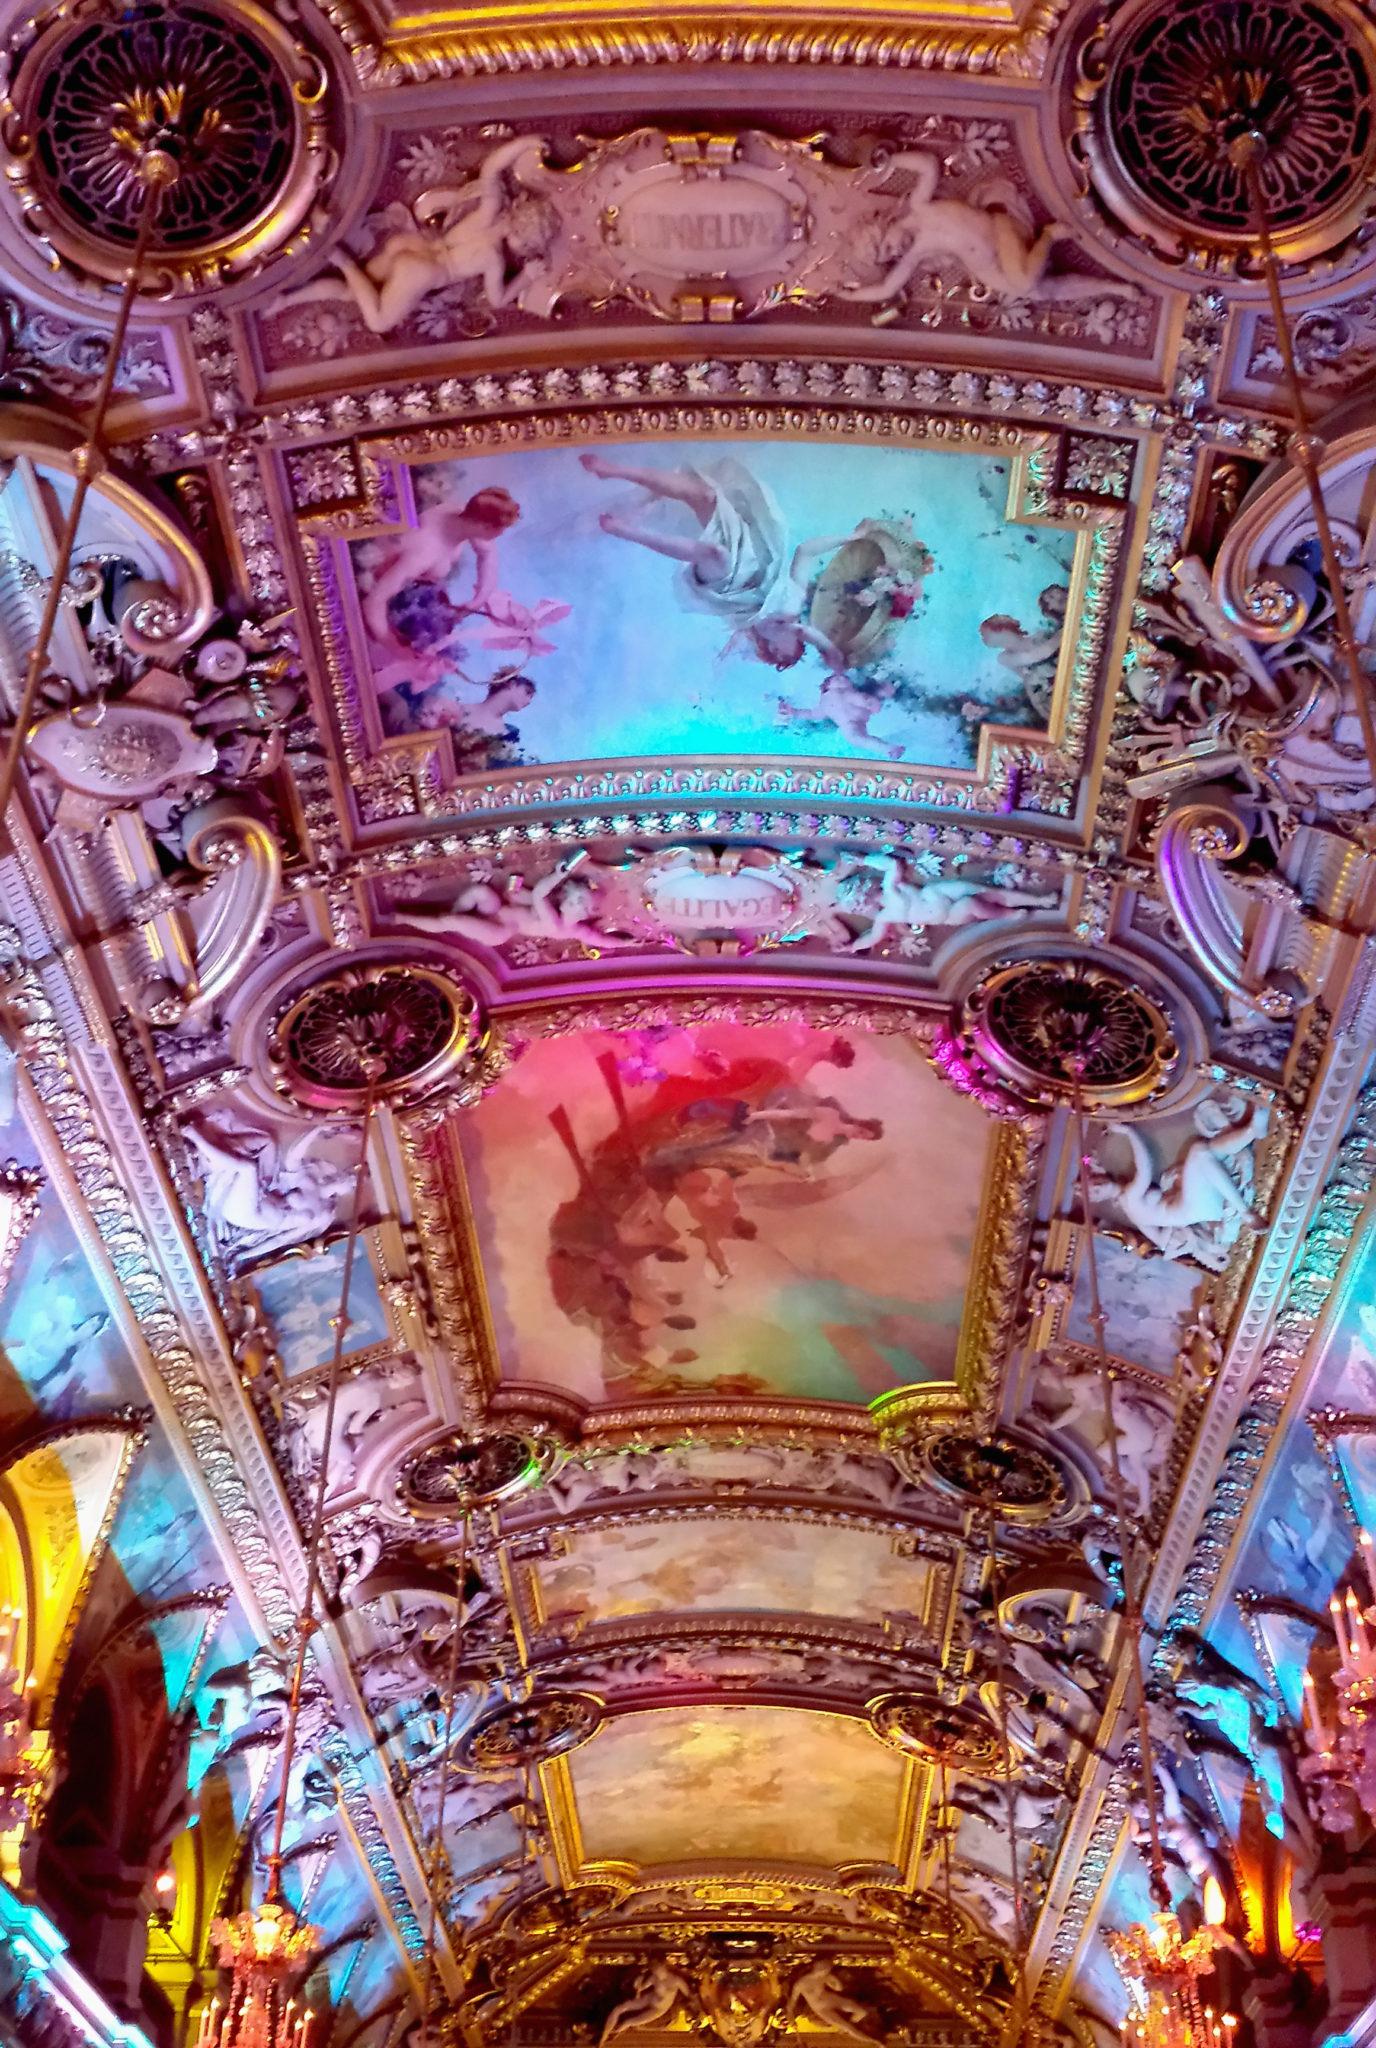 Hema_Paris_Hotel_de_ville_mairie_plafond